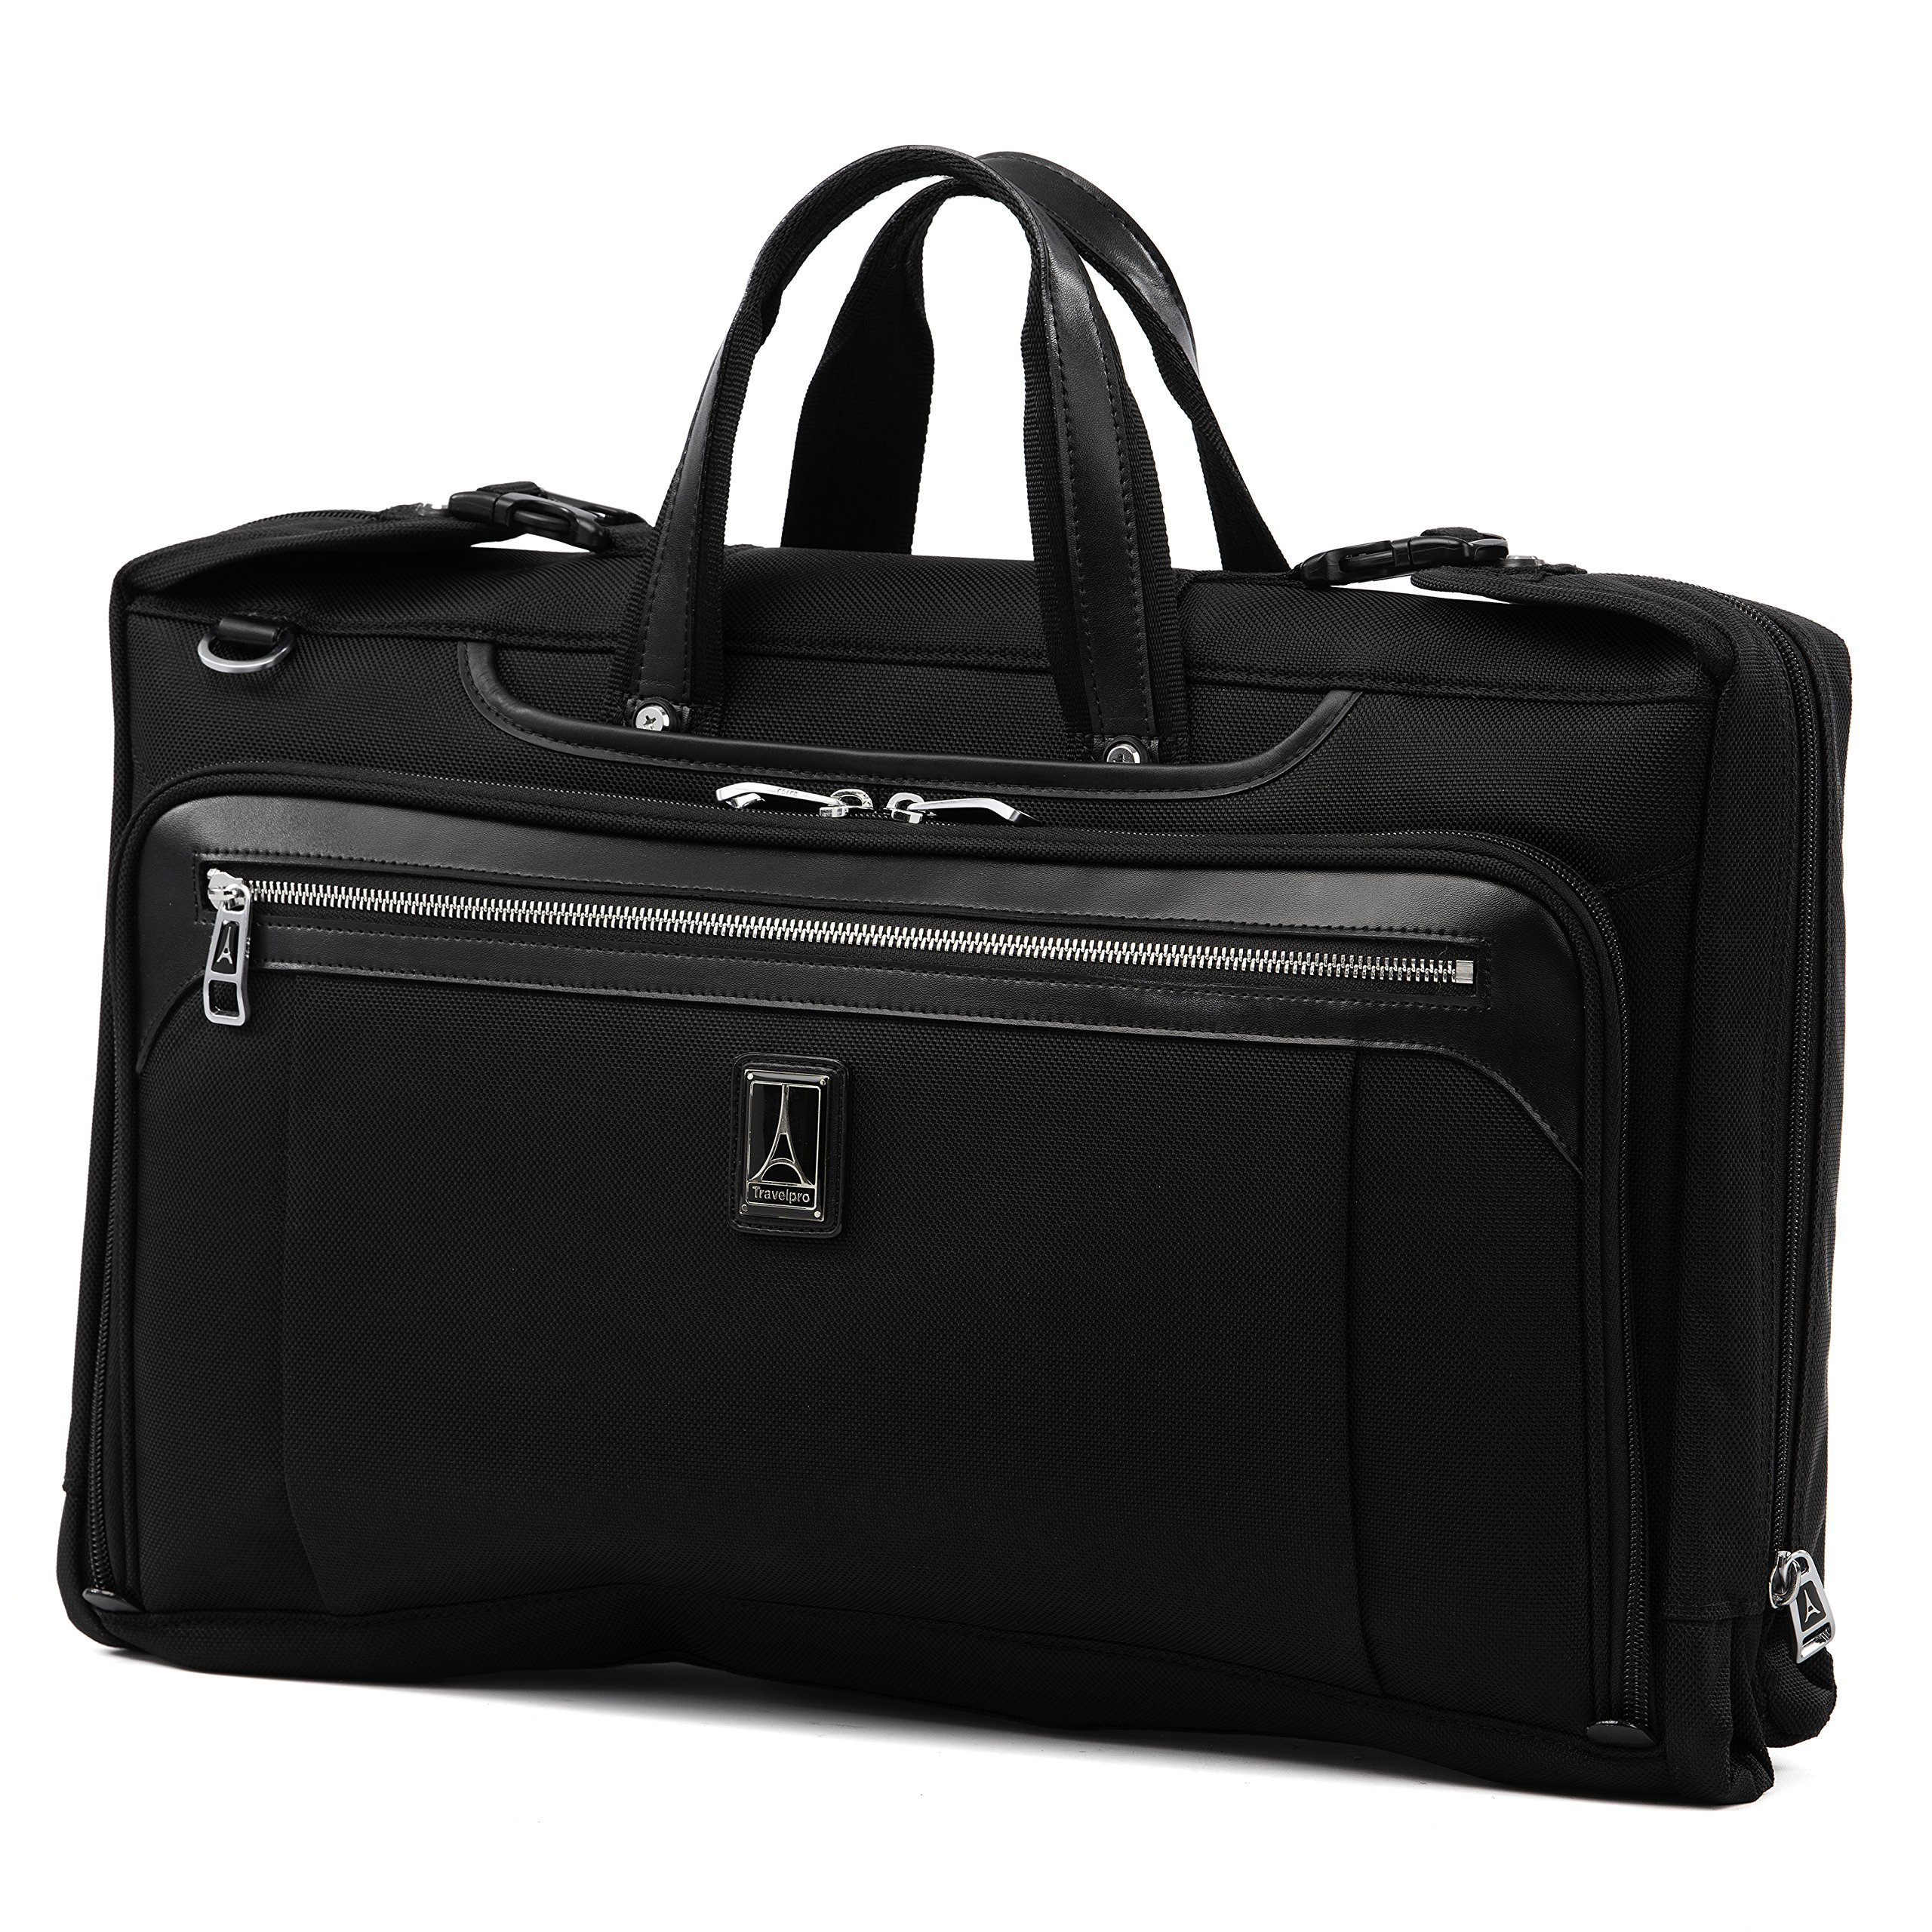 Travelpro Luggage Platinum Elite 20'' Carry-on Tri-Fold Garment Bag, Shadow Black